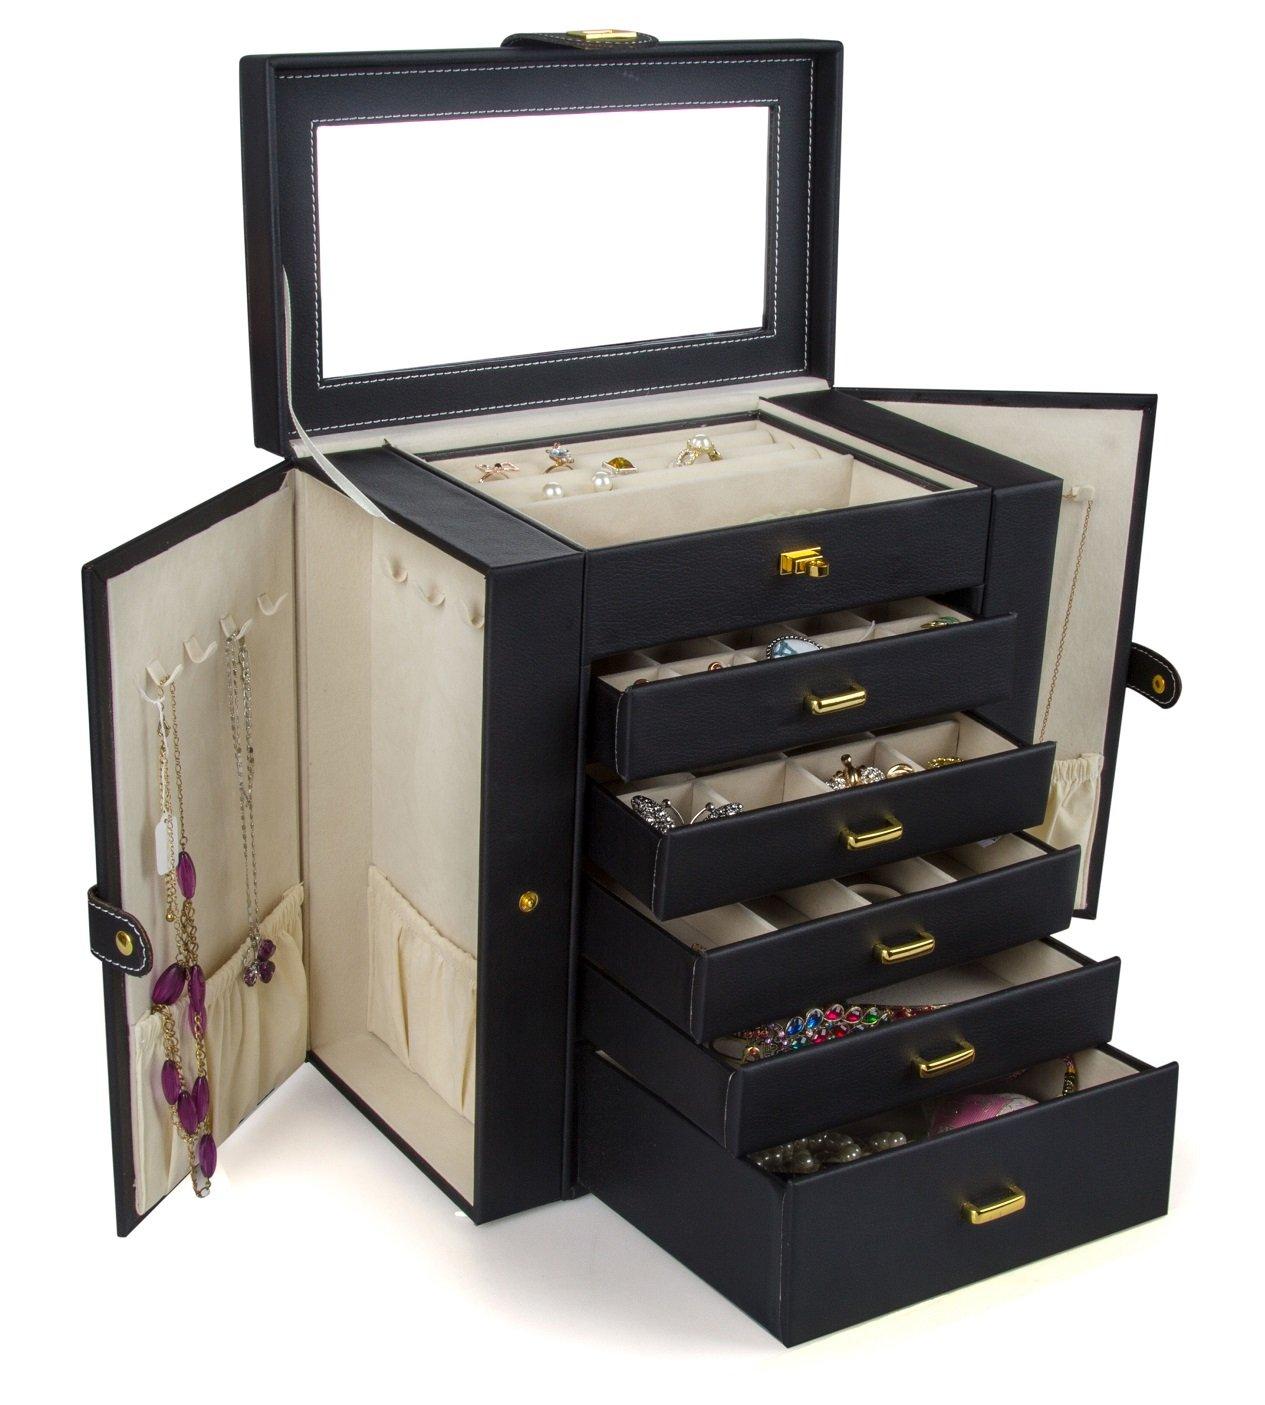 Kendal Huge Leather Jewelry Box/Case/Storage LJC-SHD5BK (Black) by Kendal